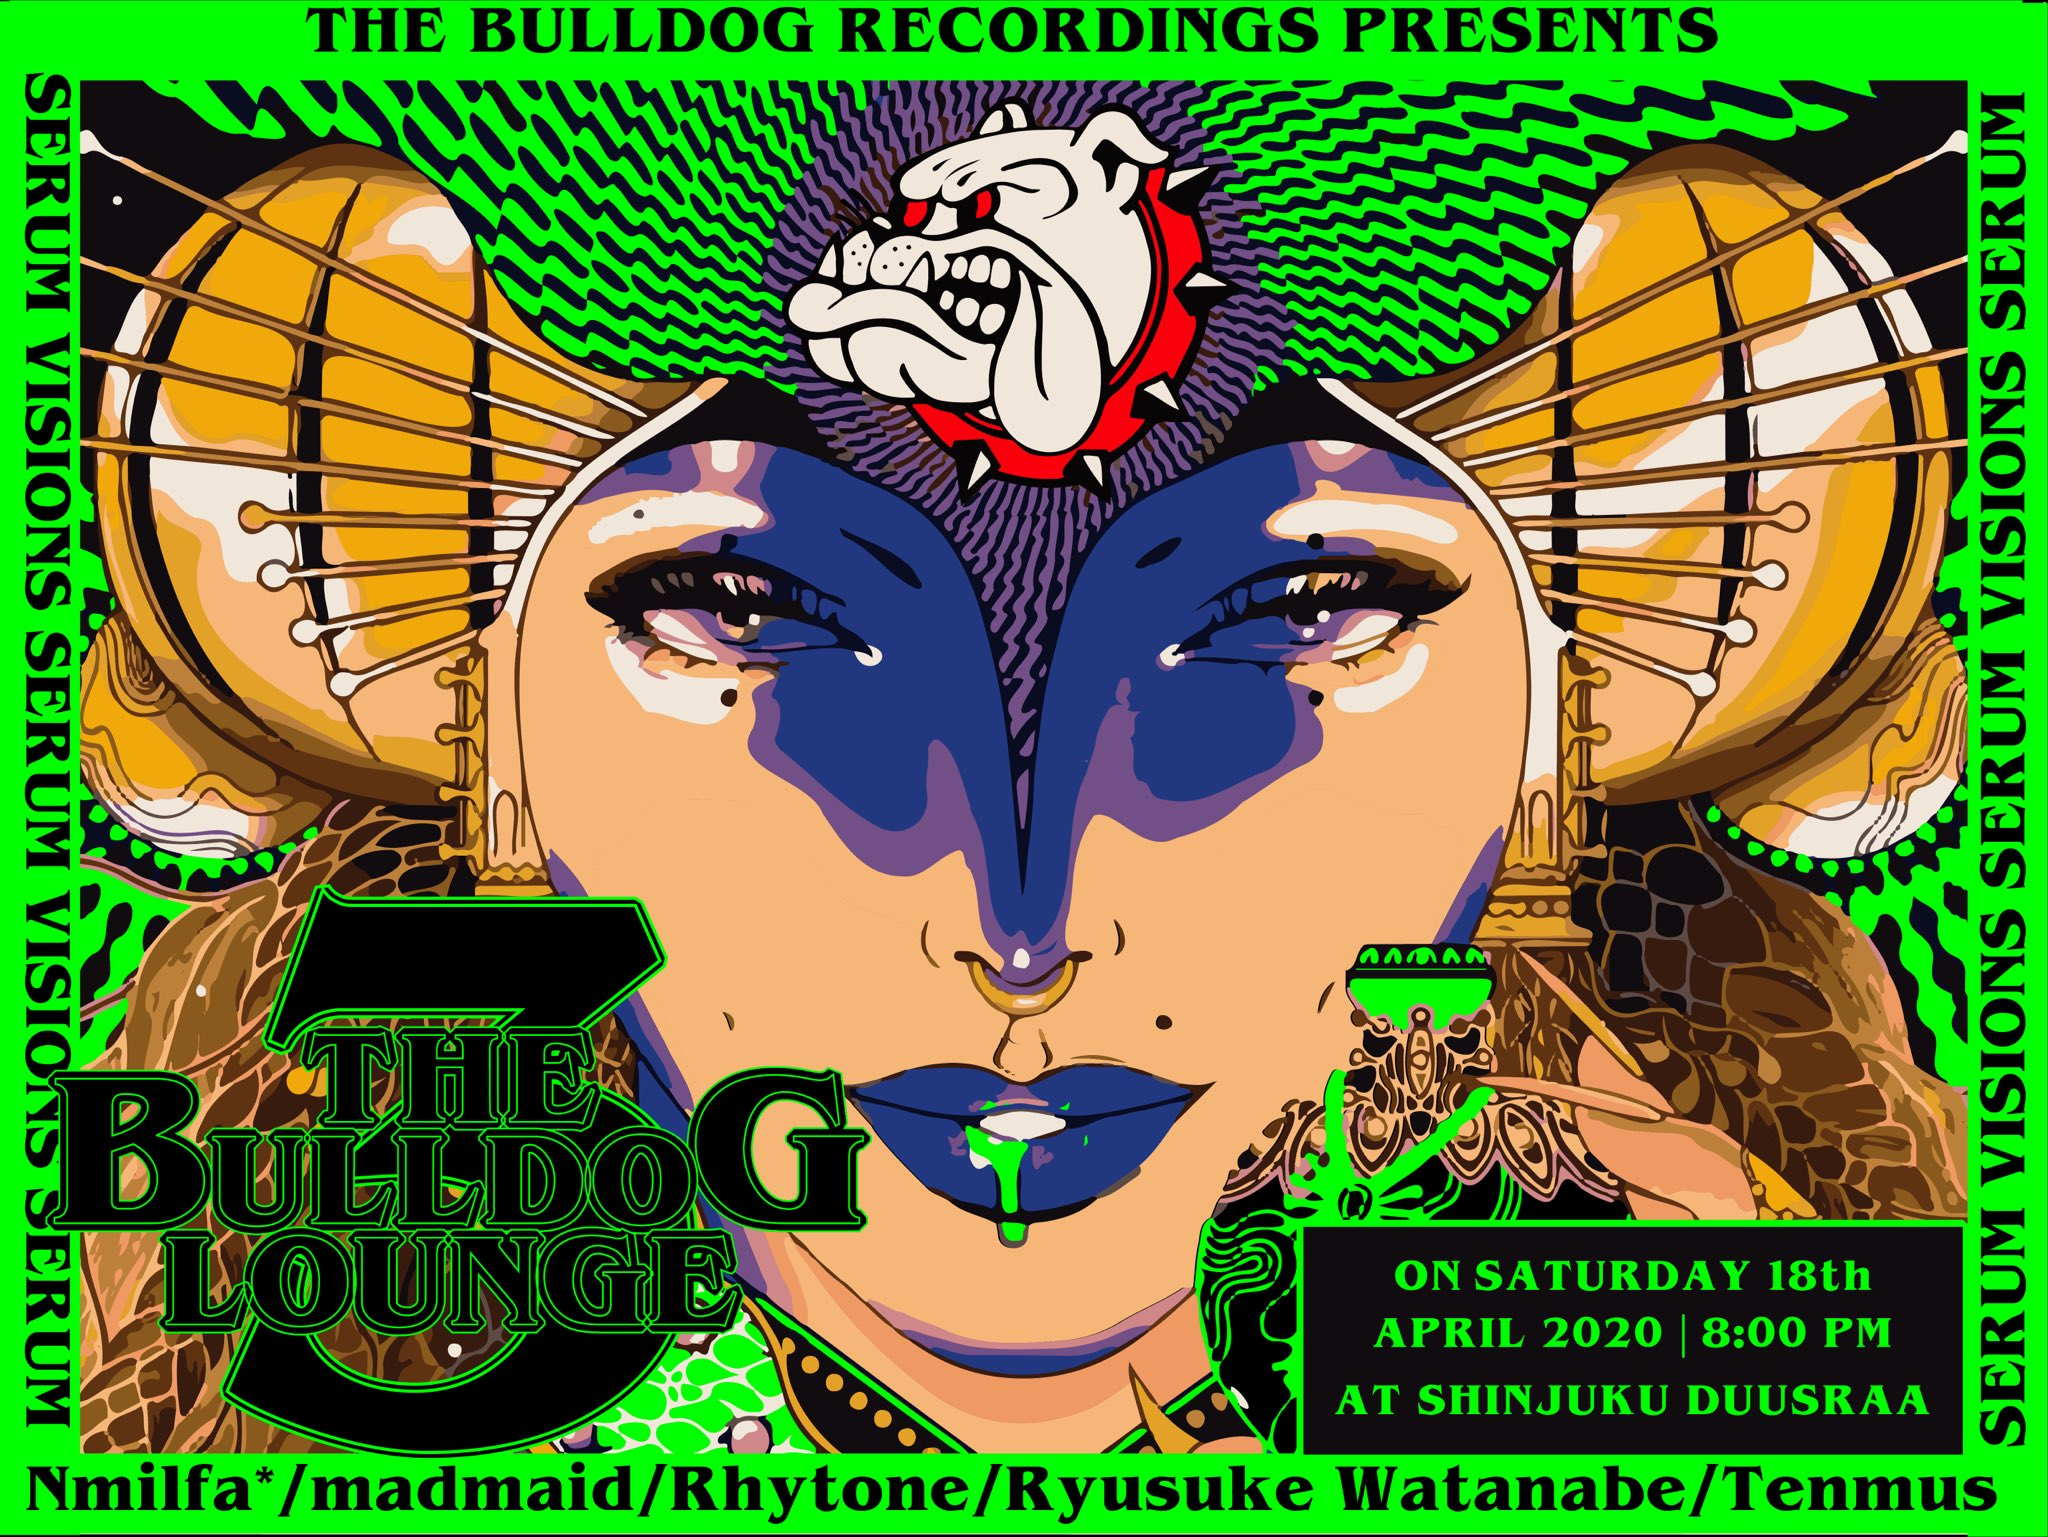 The Bulldog Lounge 3